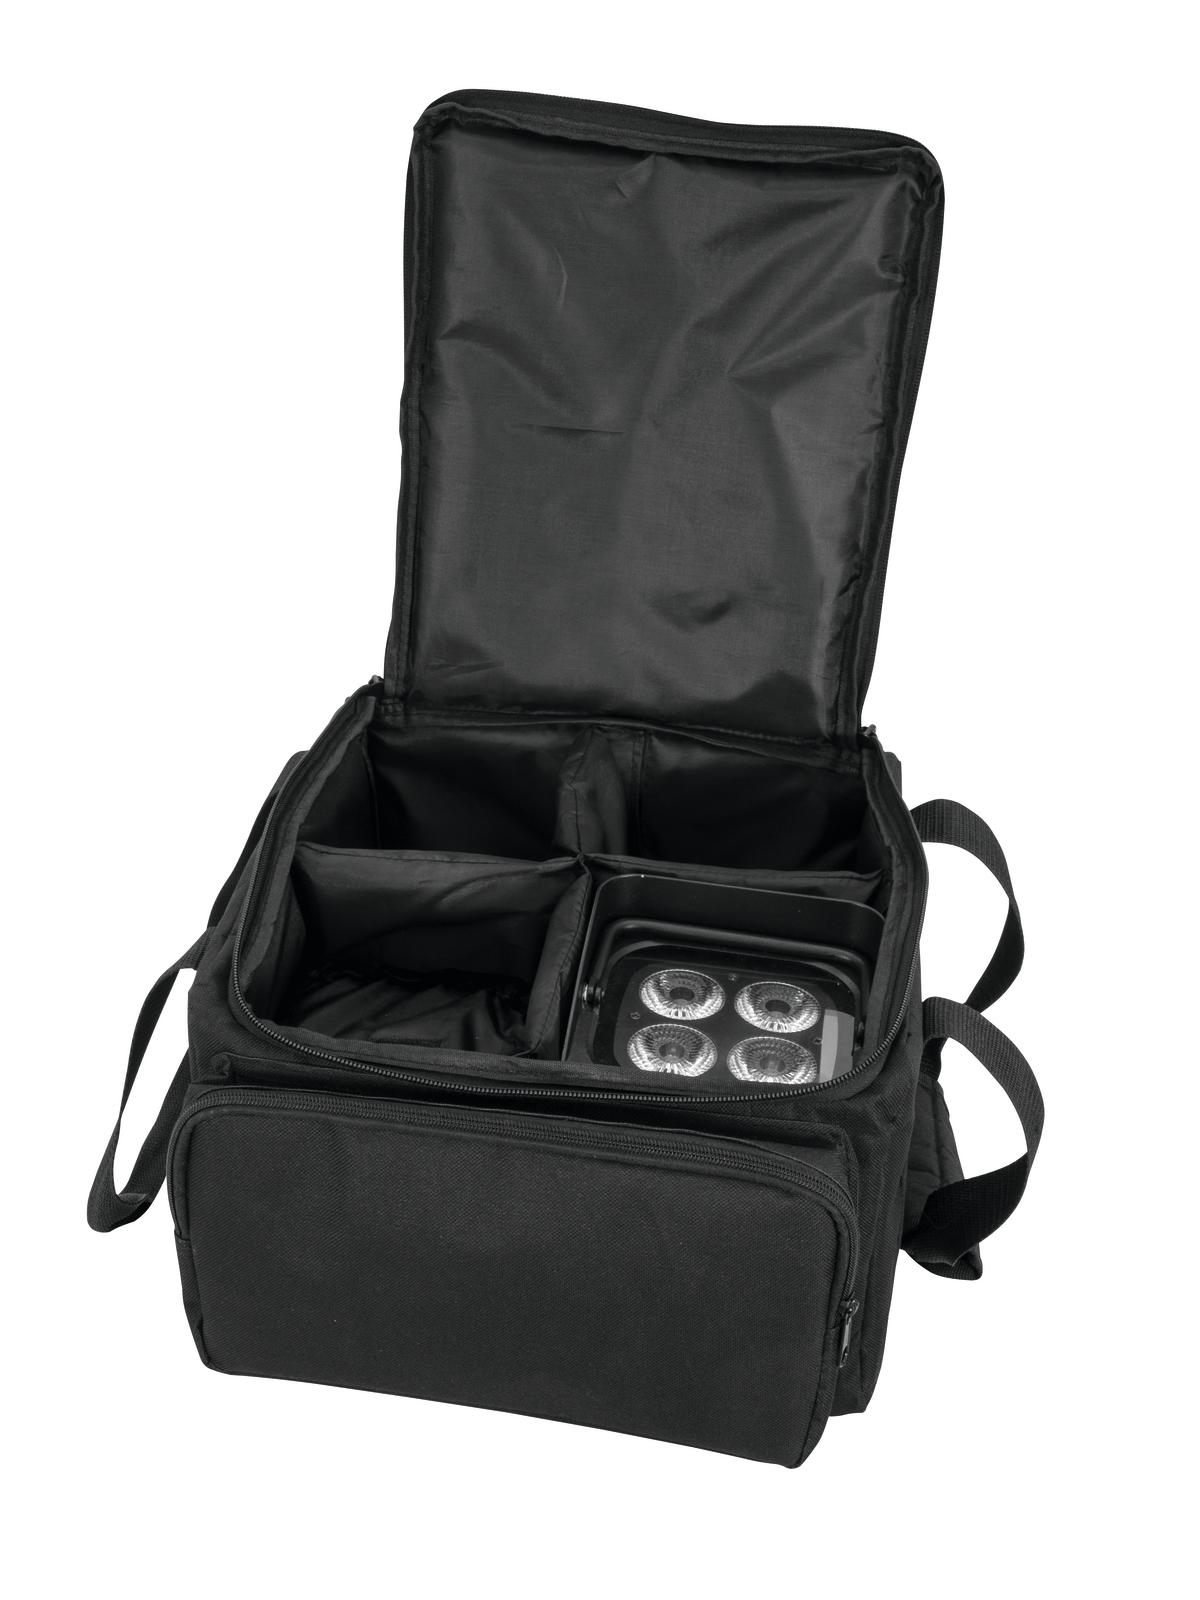 Bag bag Universal for DJ Lights moving Heads Do Spot EUROLITE SB-4